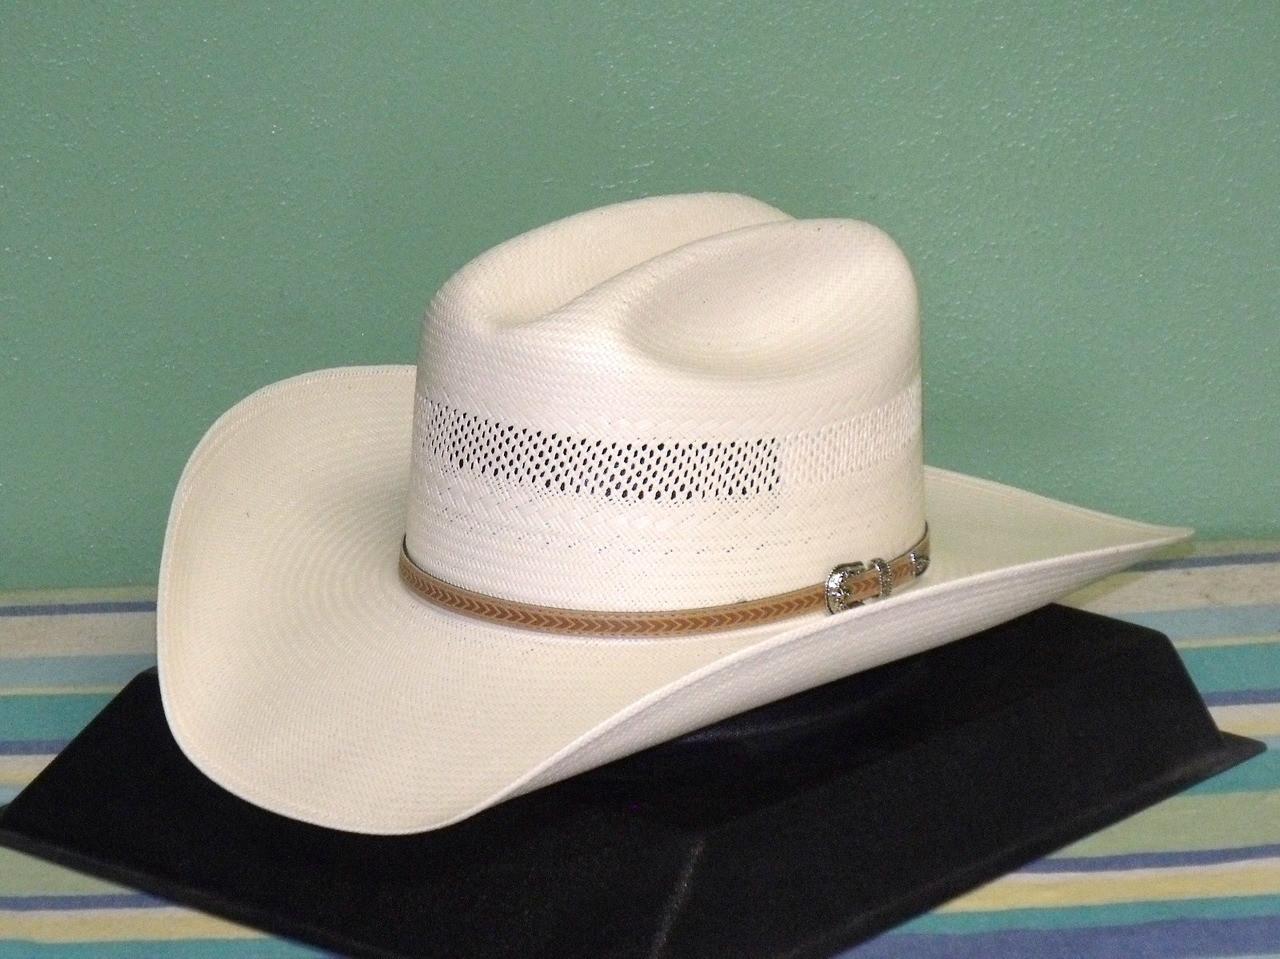 31678f854843d Stetson Arapaho 10X Shantung Straw Cowboy Hat - One 2 mini Ranch